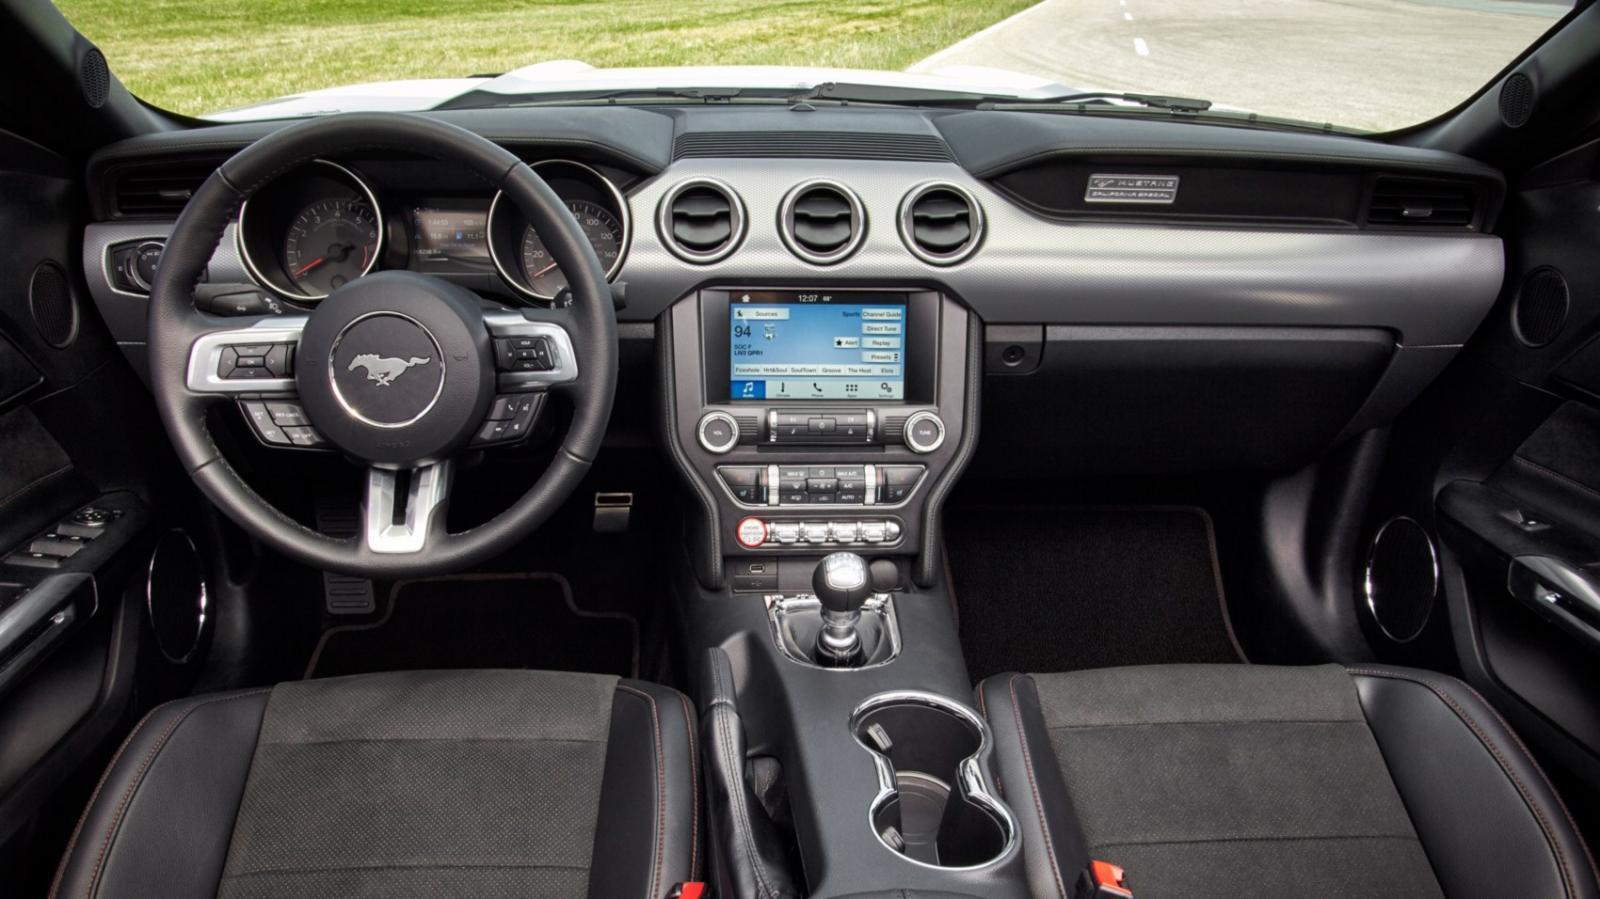 Ford Mustang 2016 interior